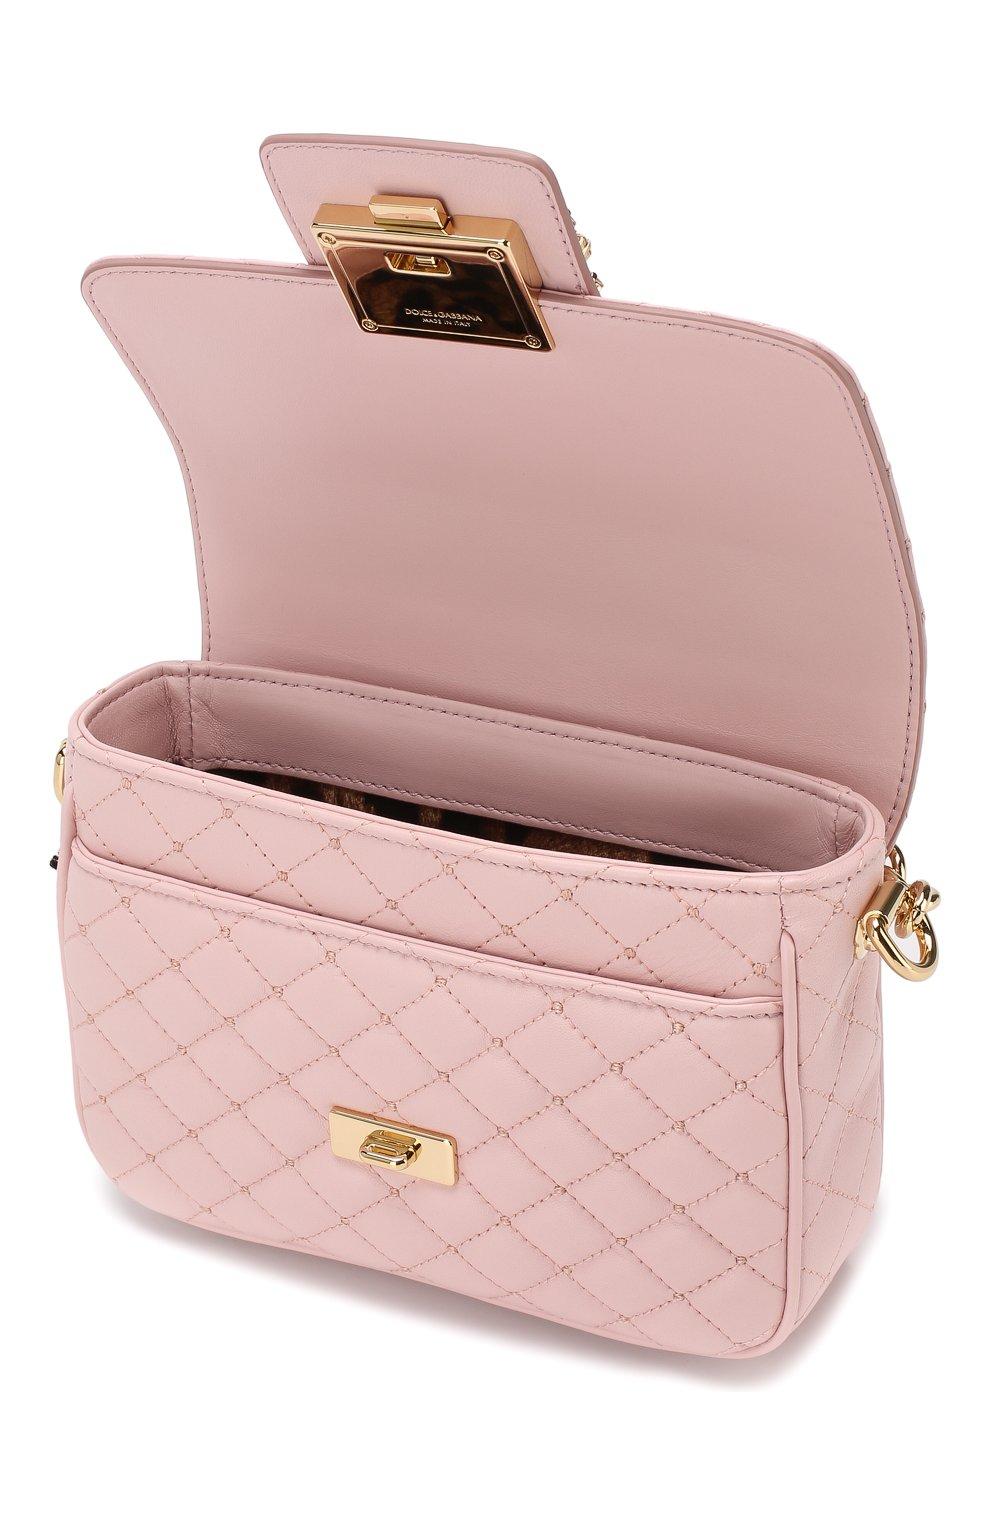 Сумка DG Millennials Dolce & Gabbana светло-розовая цвета   Фото №4